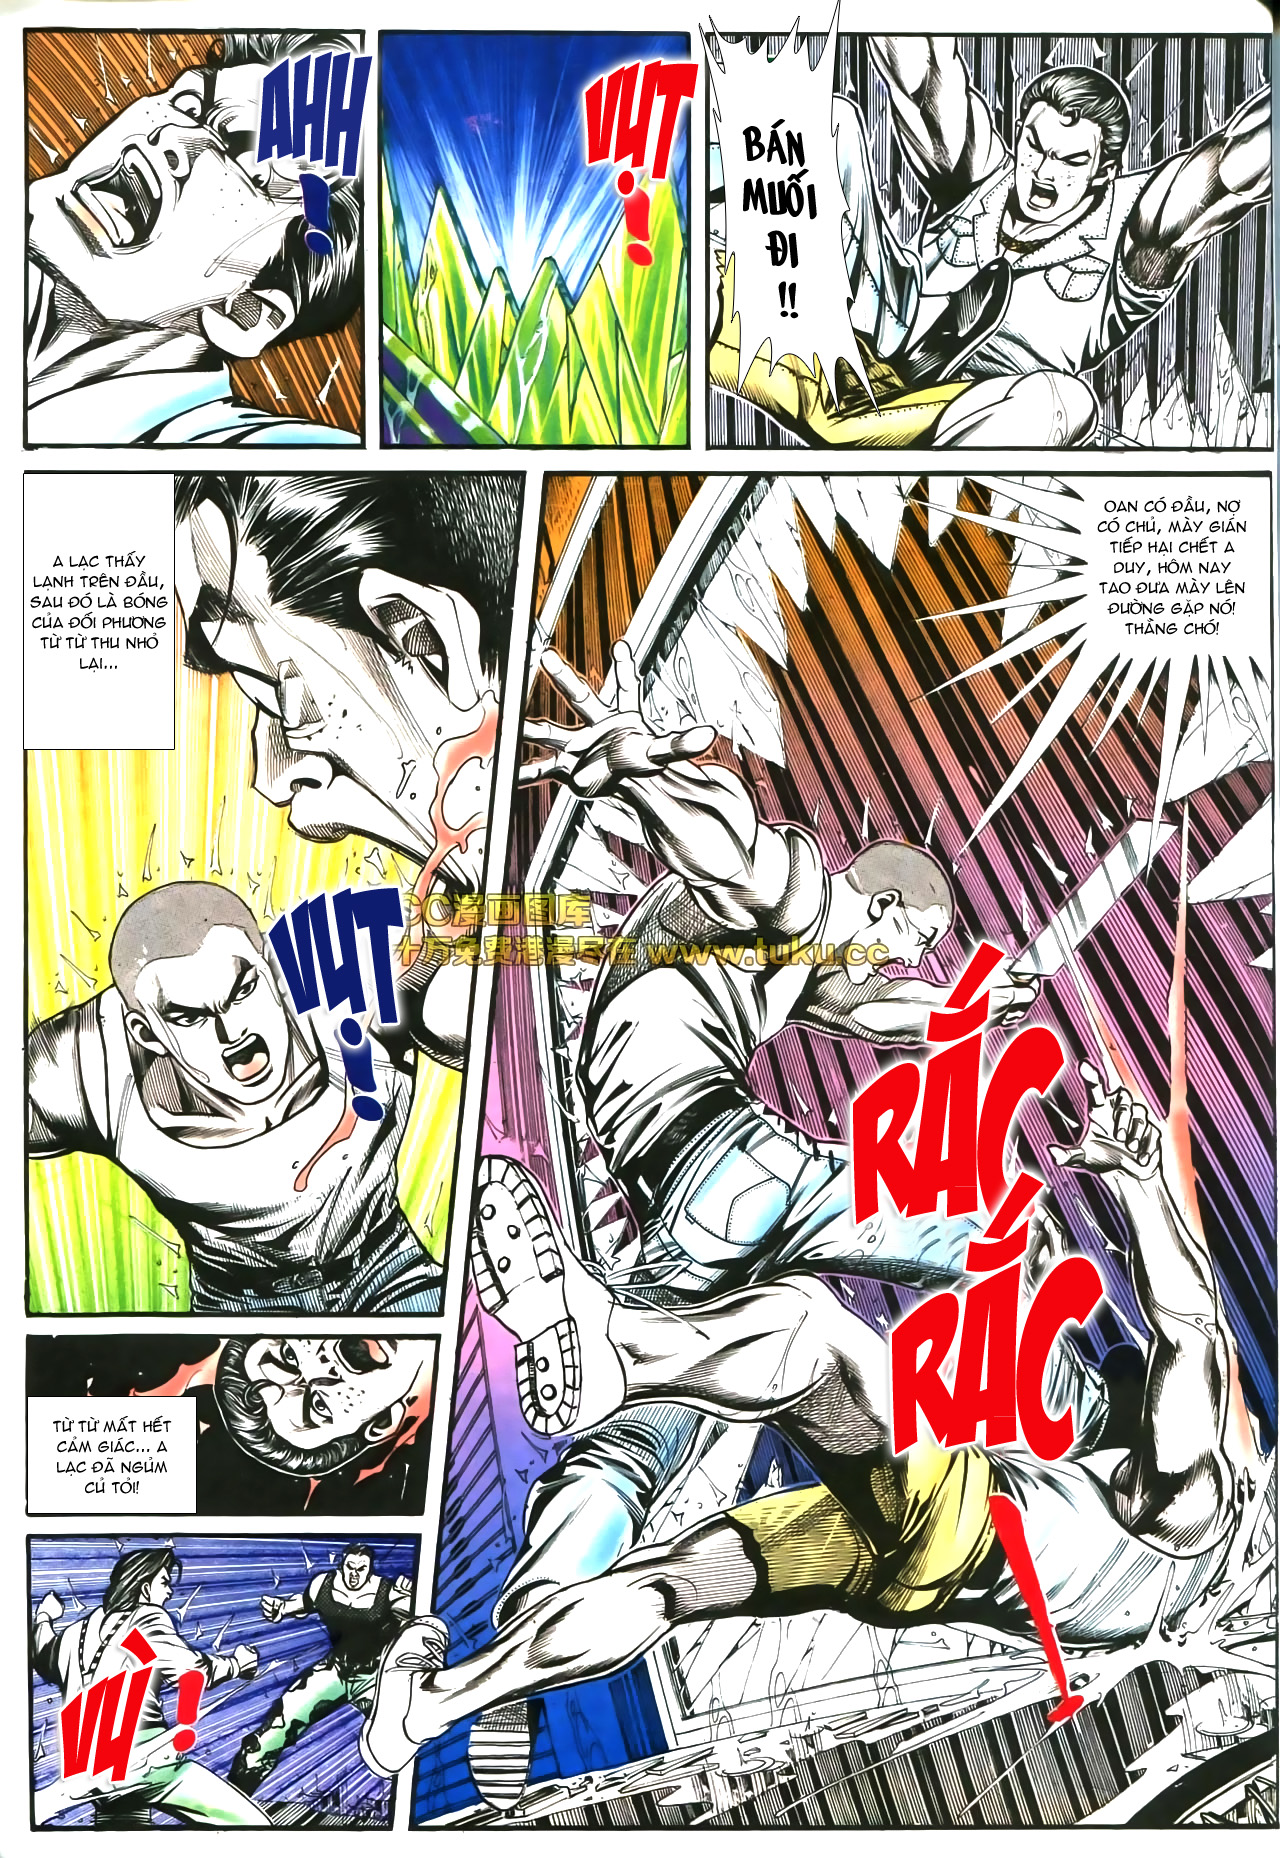 Người Trong Giang Hồ chapter 173: da ngựa bọc thây trang 21